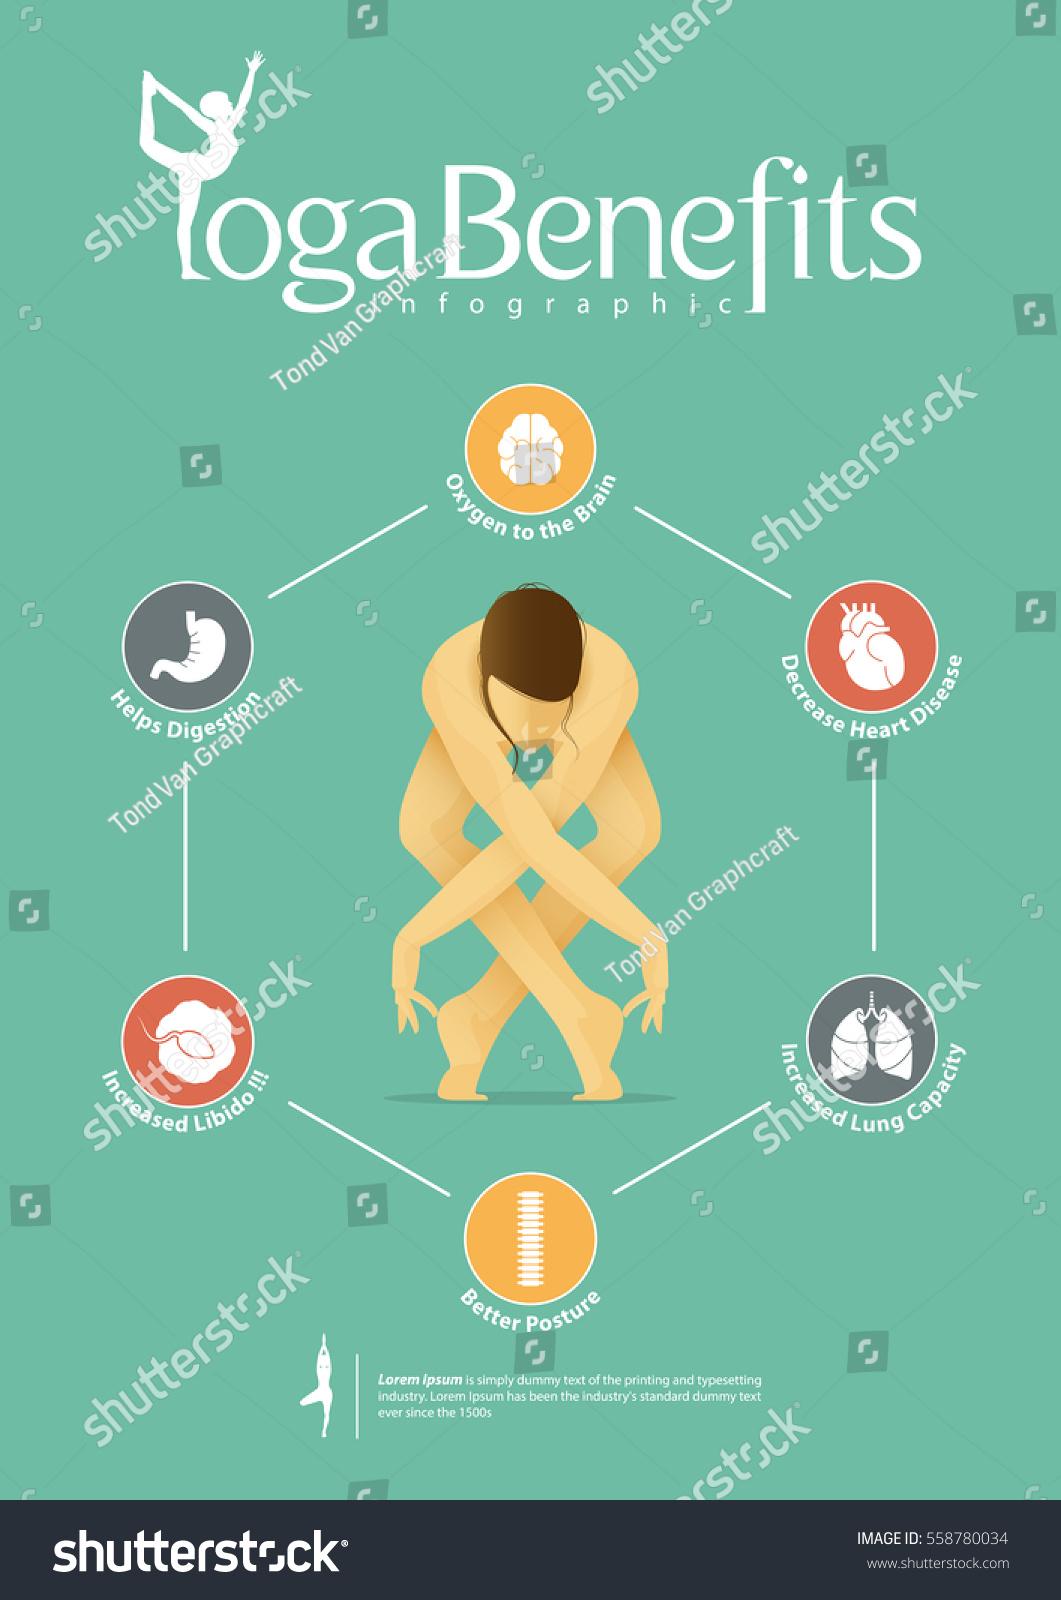 Infographic Yoga Poses Yoga Benefits Flat Stock Vector Royalty Free 558780034